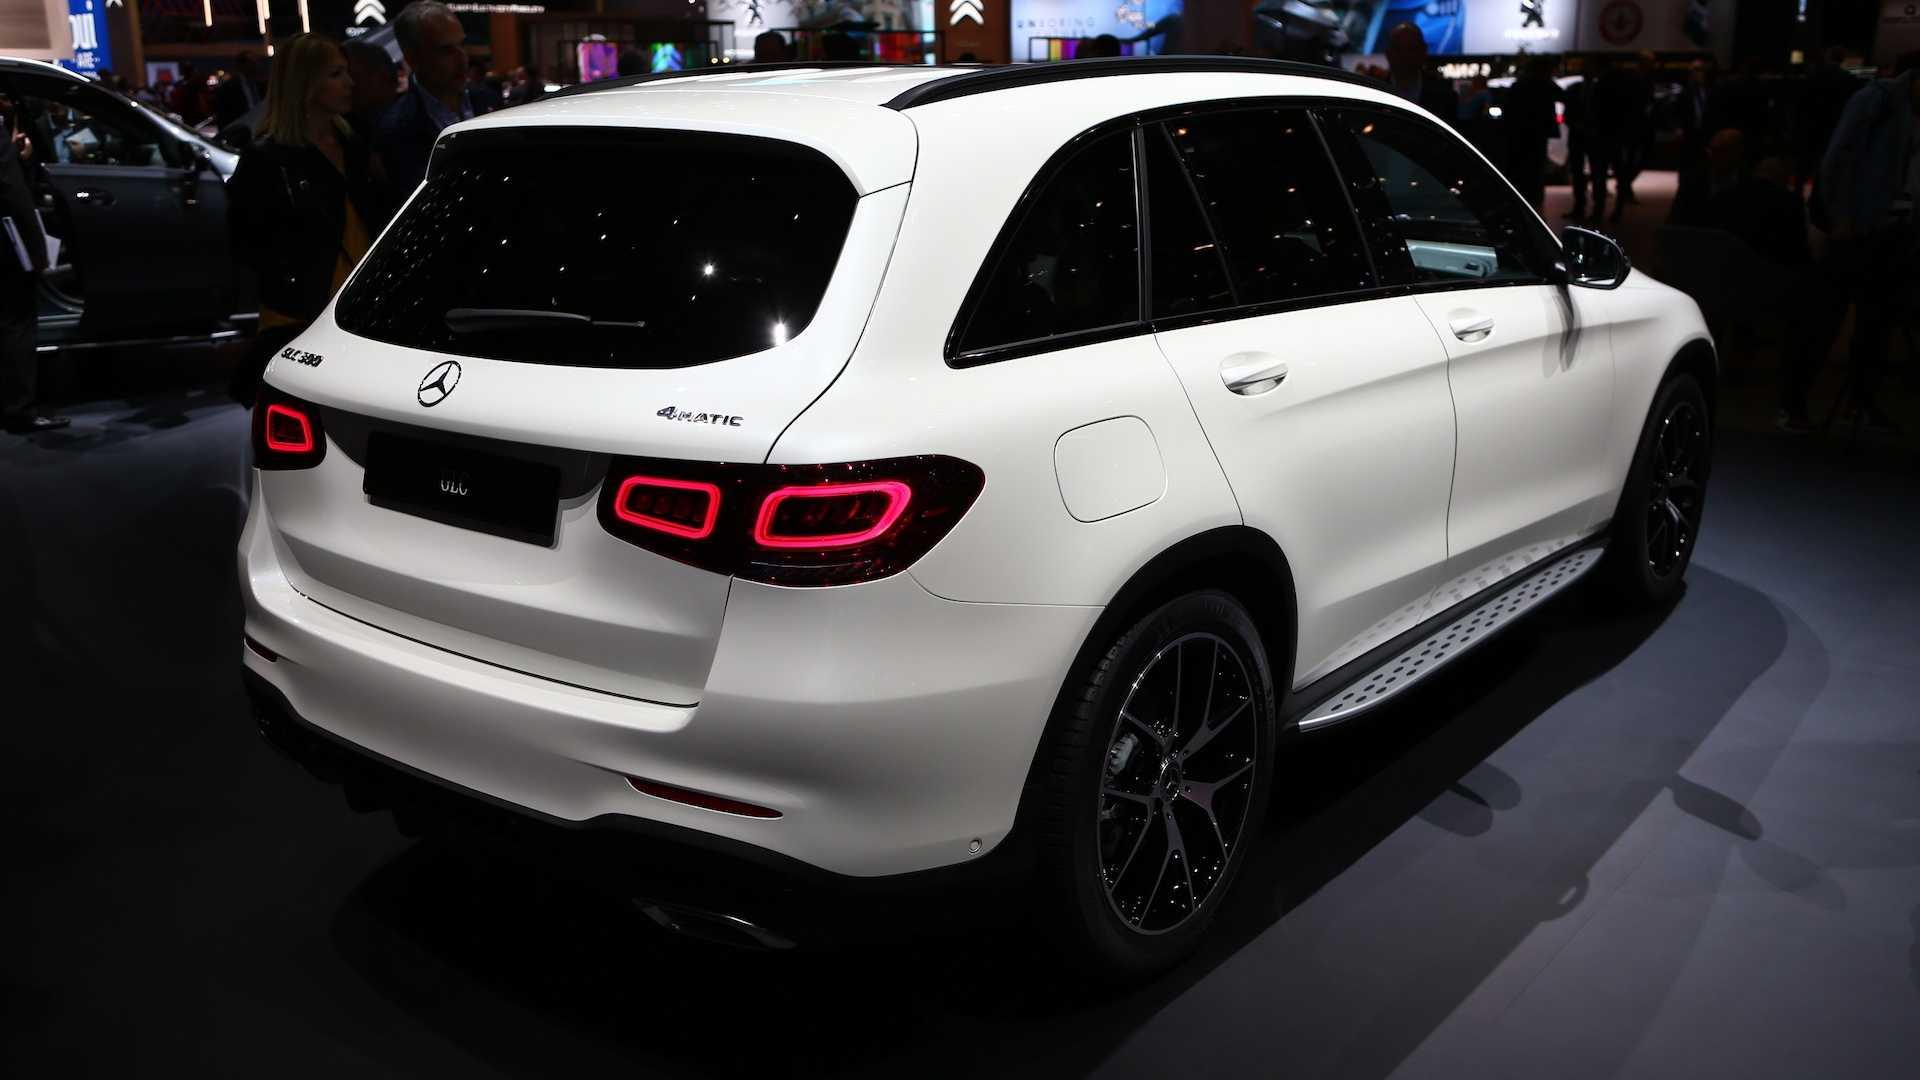 2020 Mercedes Benz Glc Quot Facelift Quot Revealed Neoadviser